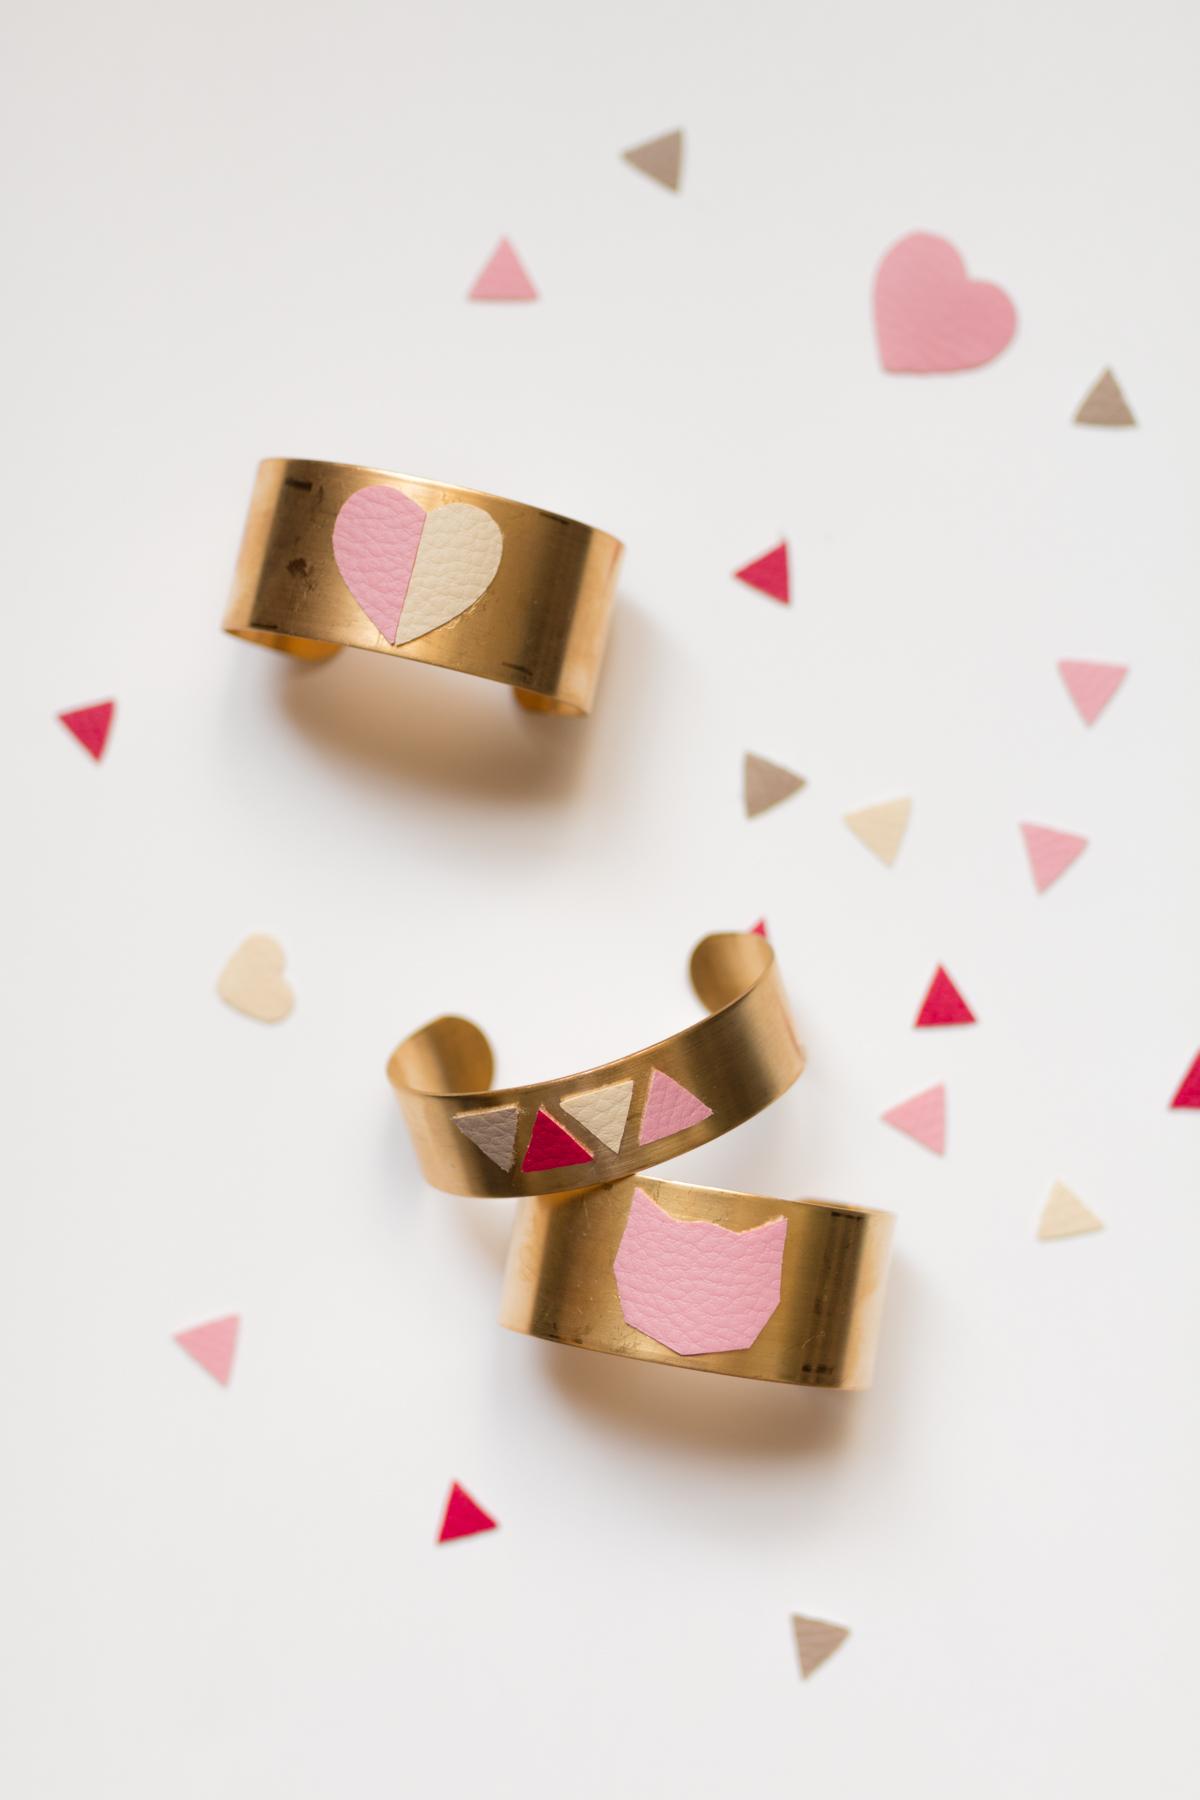 Diy bijou bracelet manchette I Sp4nkblog-8